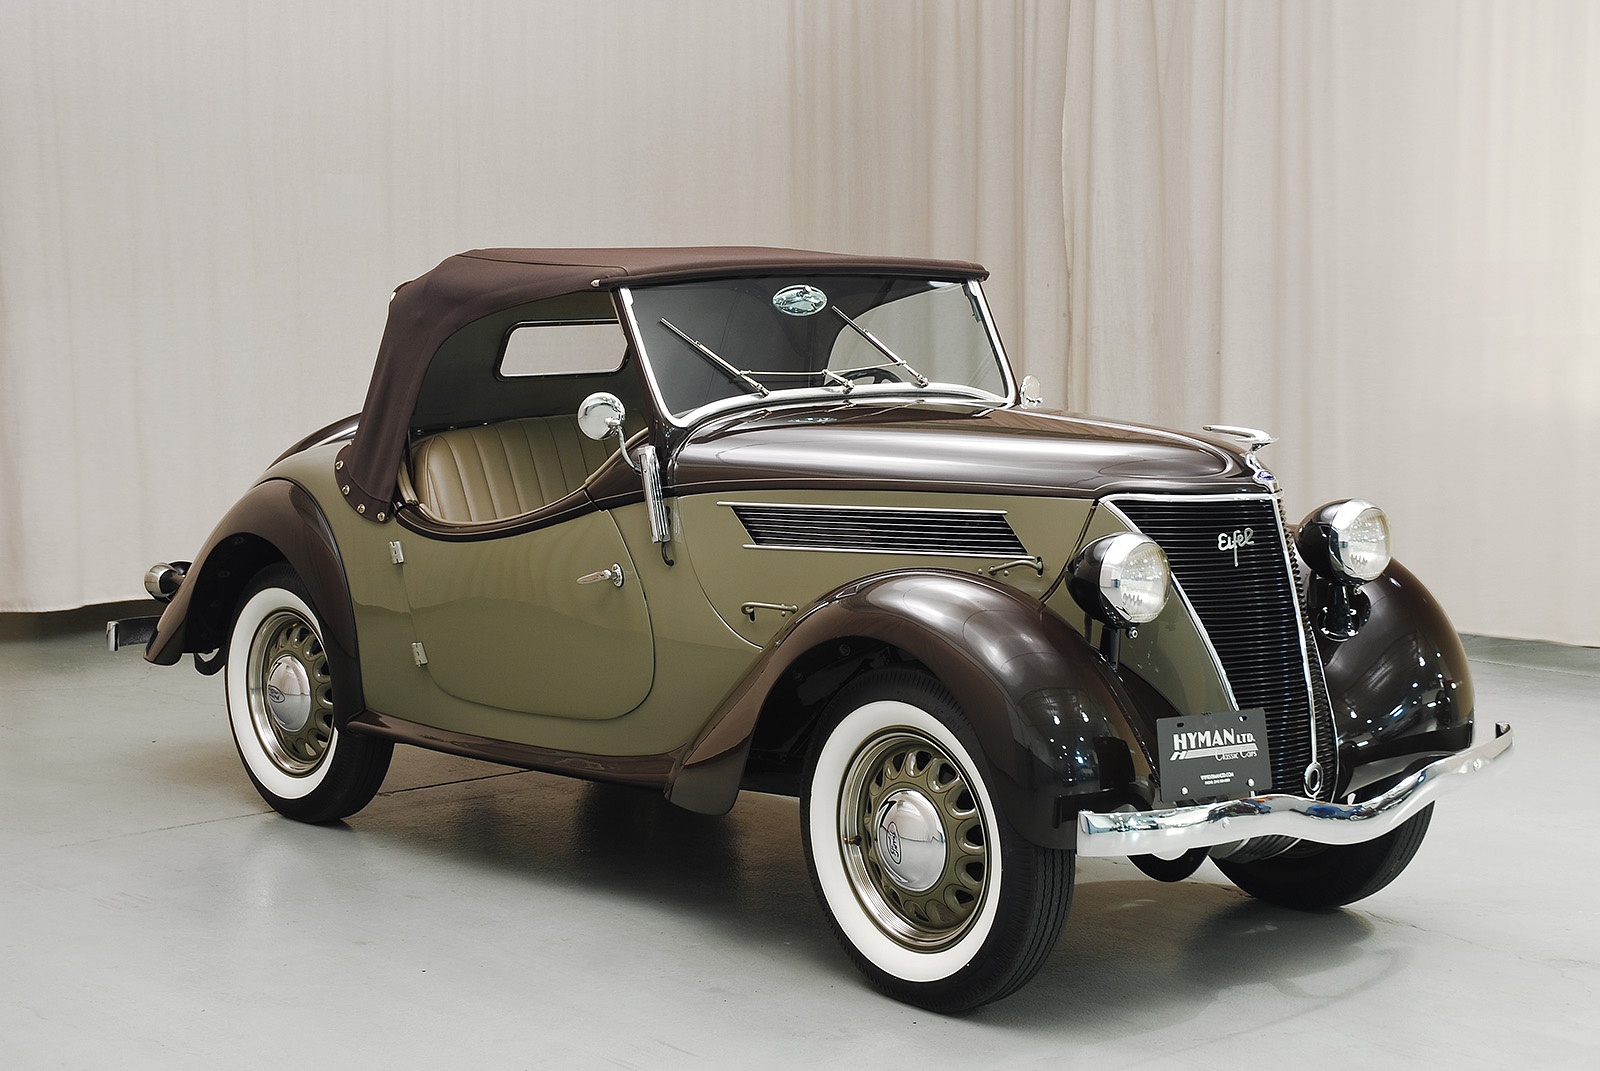 1937 Ford Eifel Roadster | Hyman Ltd. Classic Cars